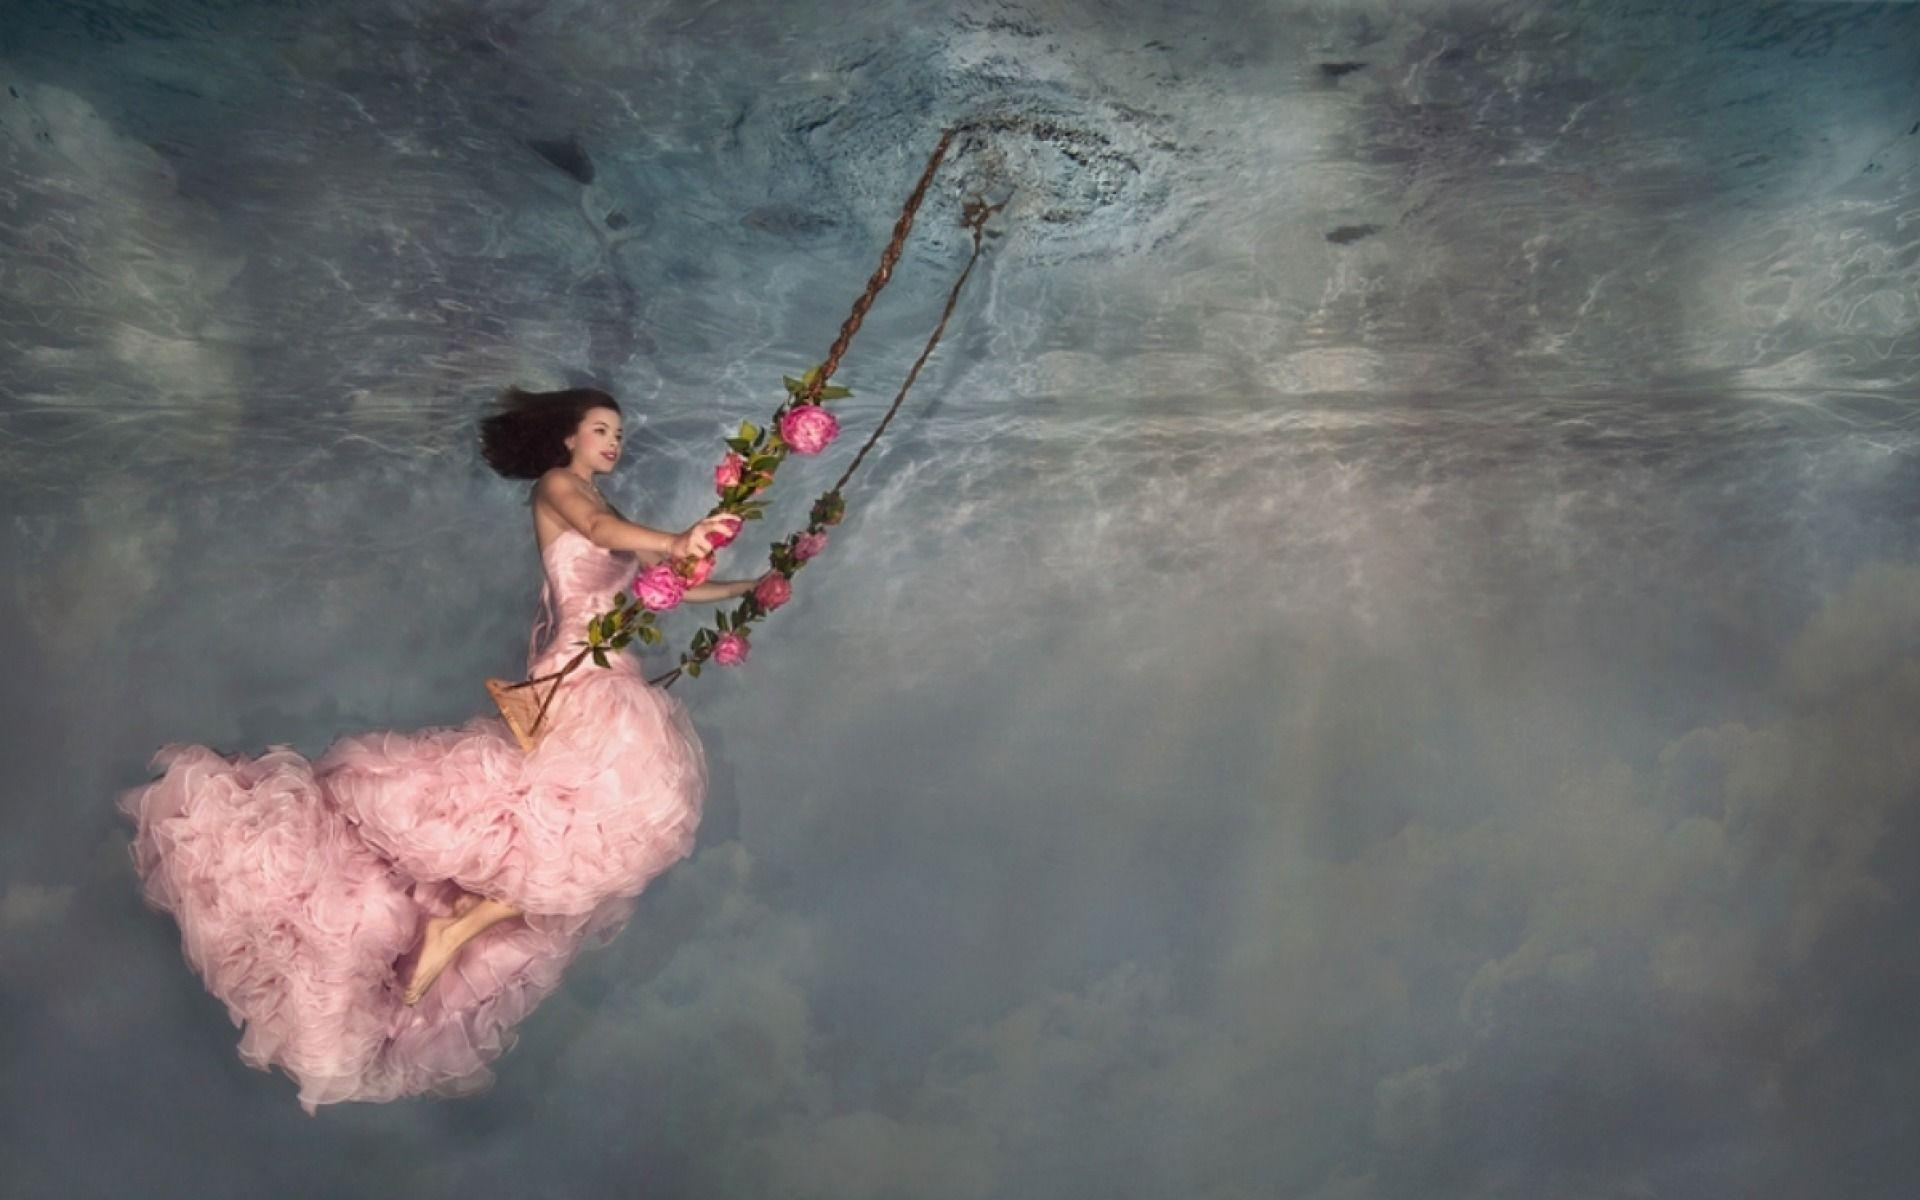 Underwater Swing wallpapers | Underwater Swing stock photos